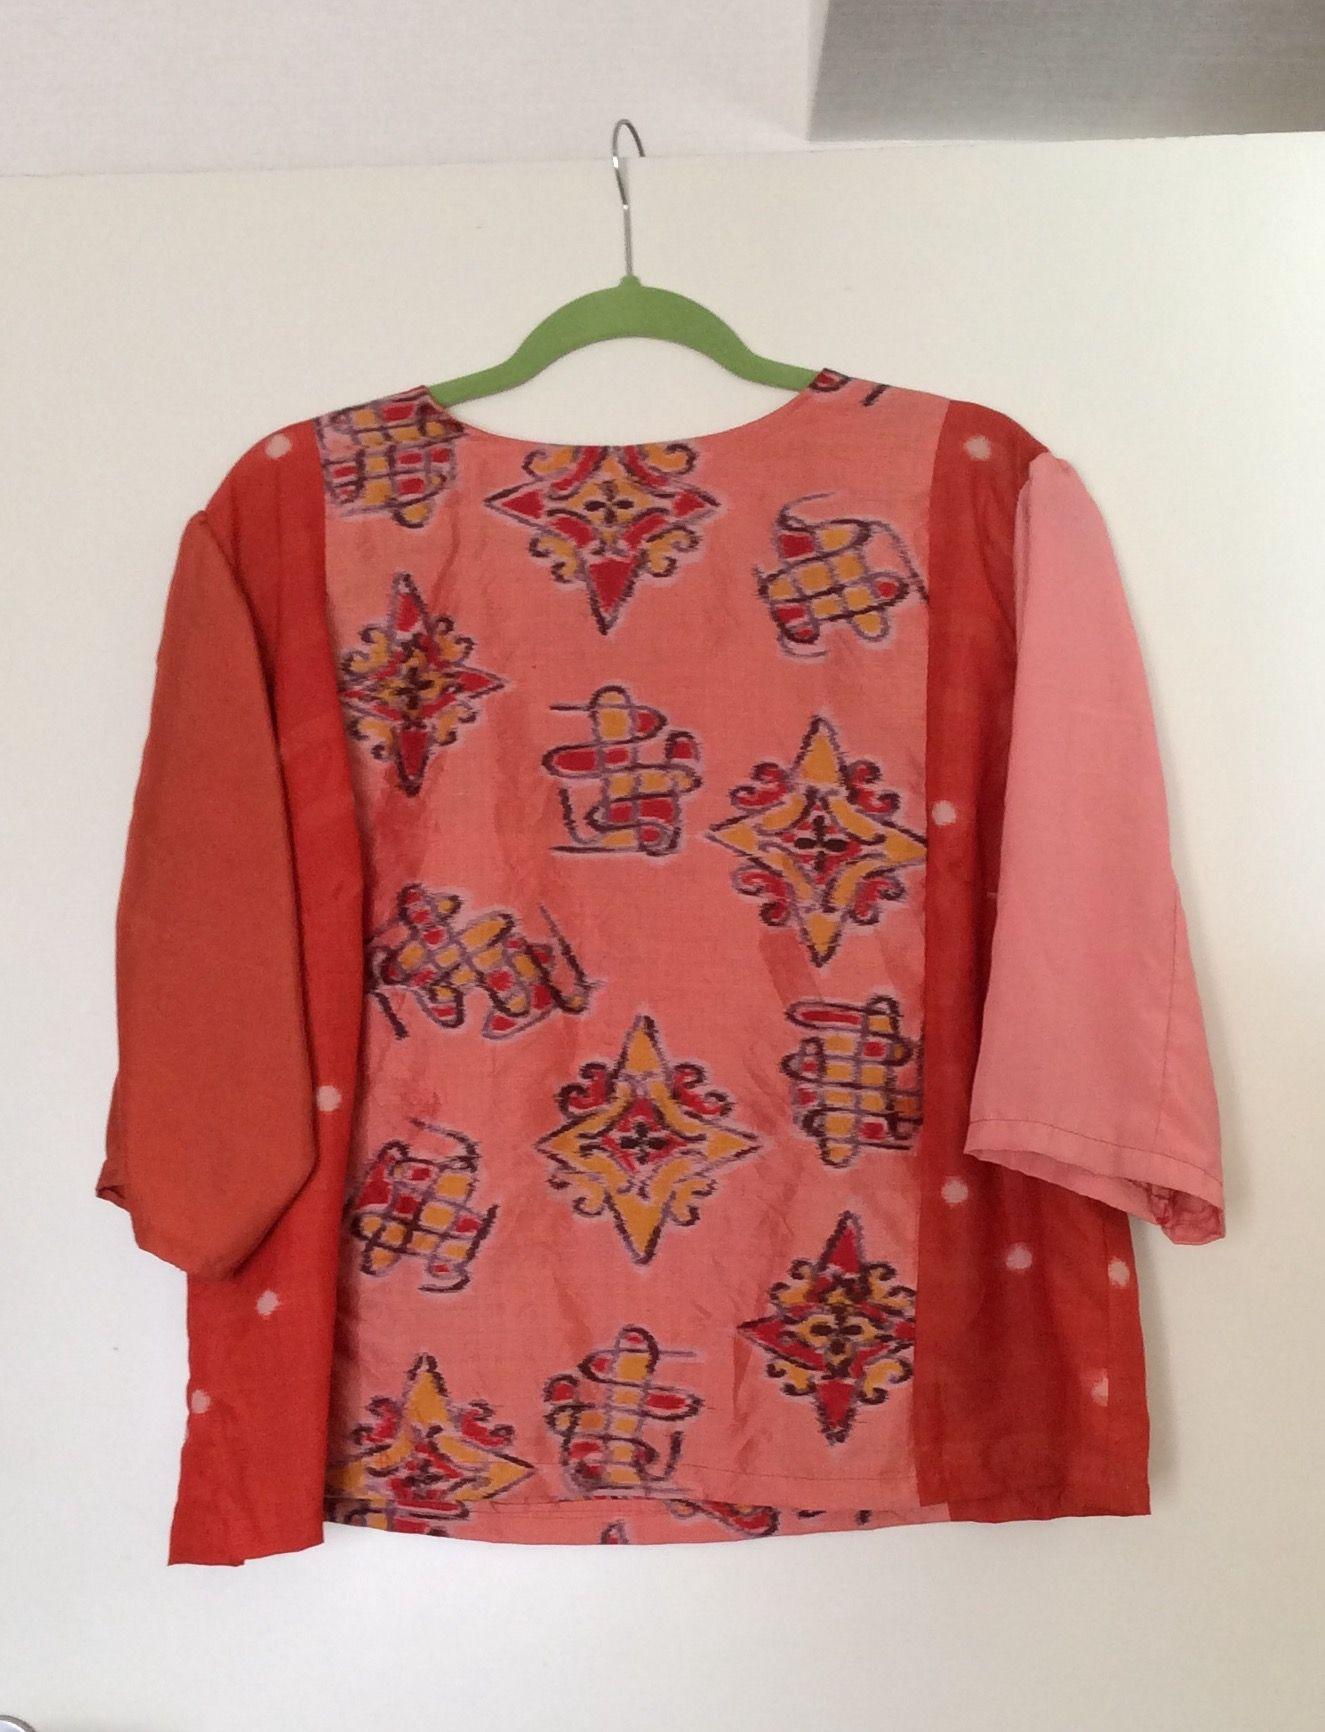 Made of the various Vintage Kimono fabrics.